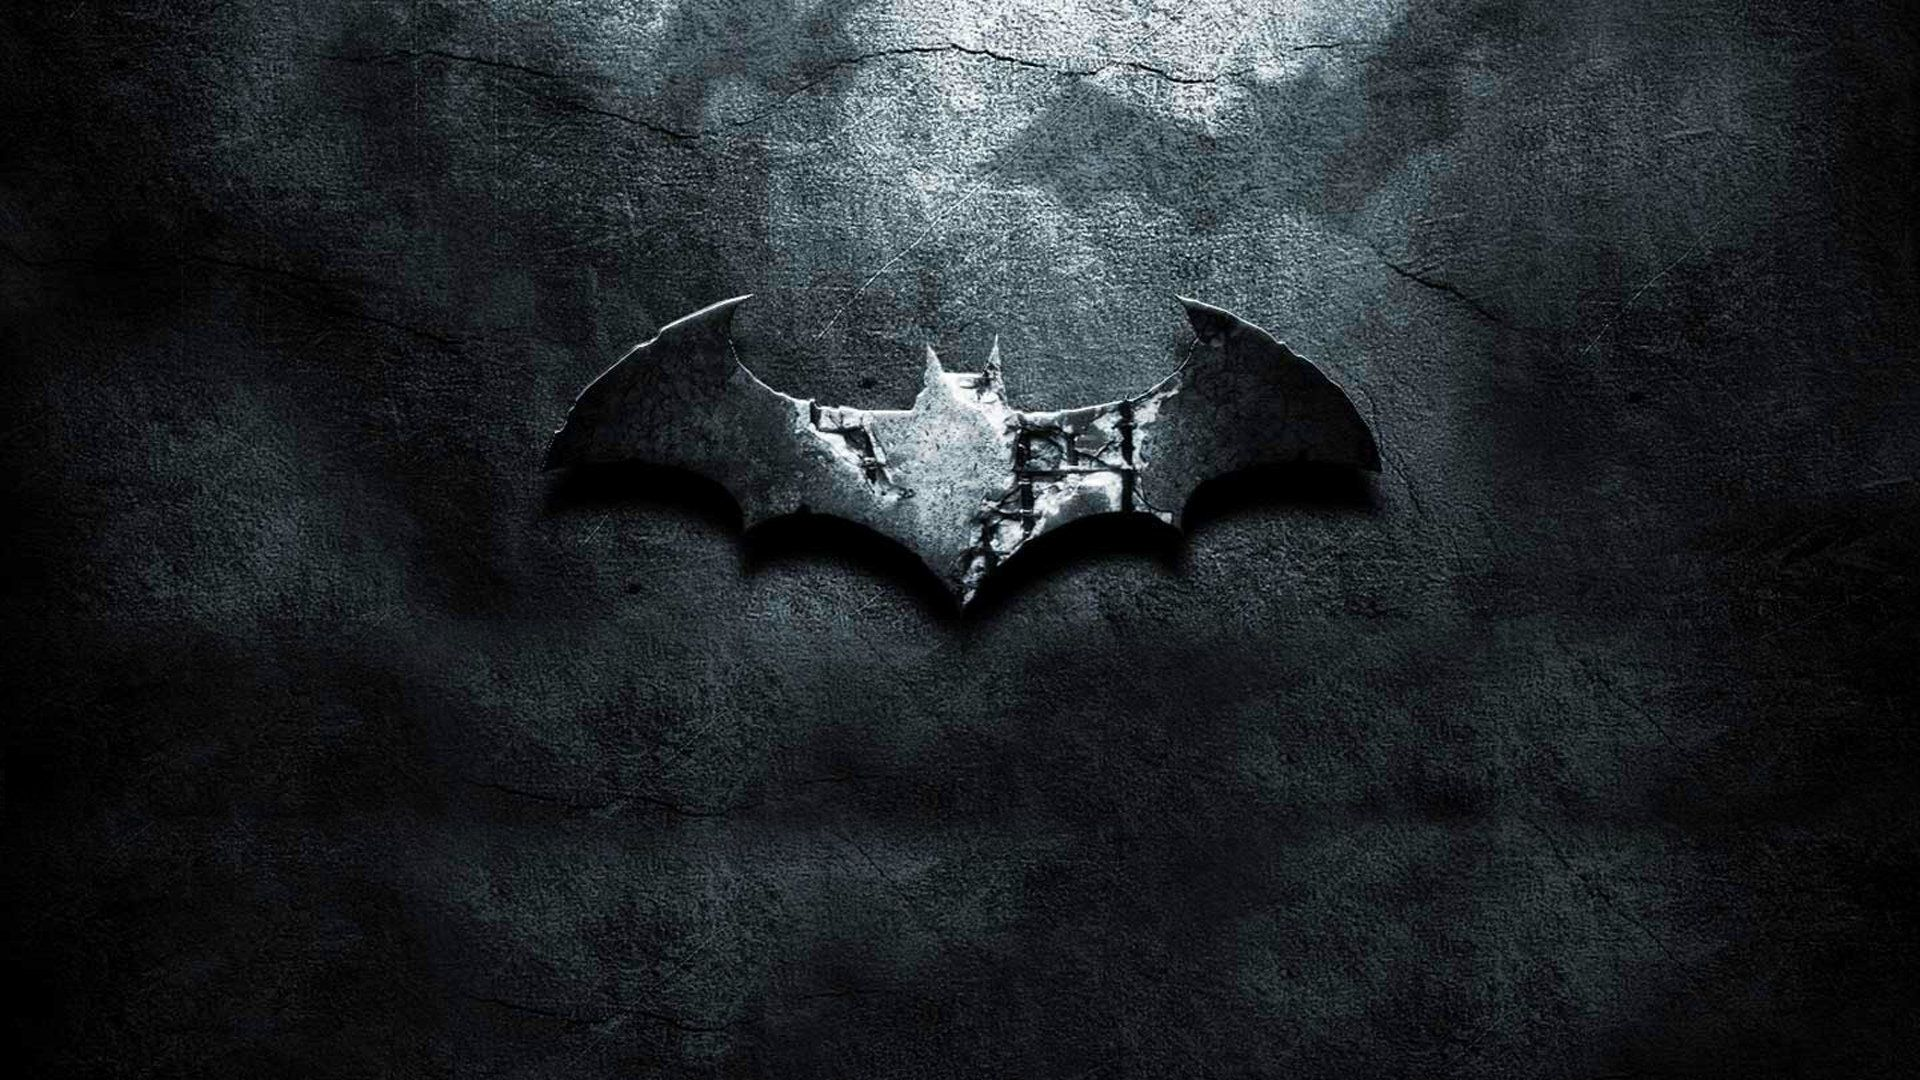 Wallpapers For Batman Logo Wallpaper Hd 1080p 1920x1080